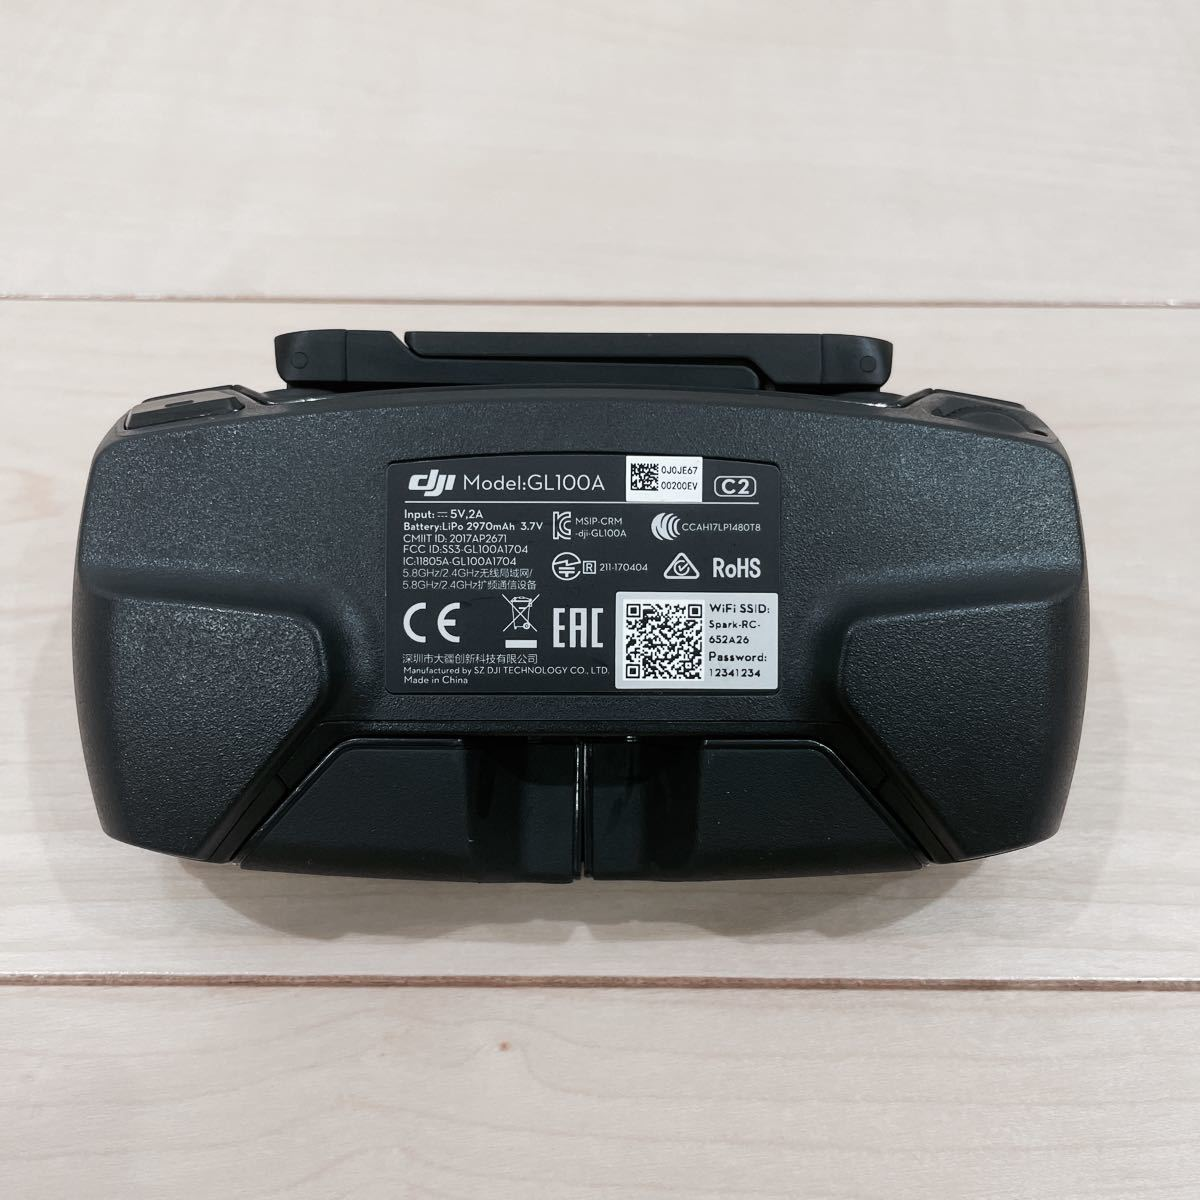 DJI SPARK コントローラー 送信機